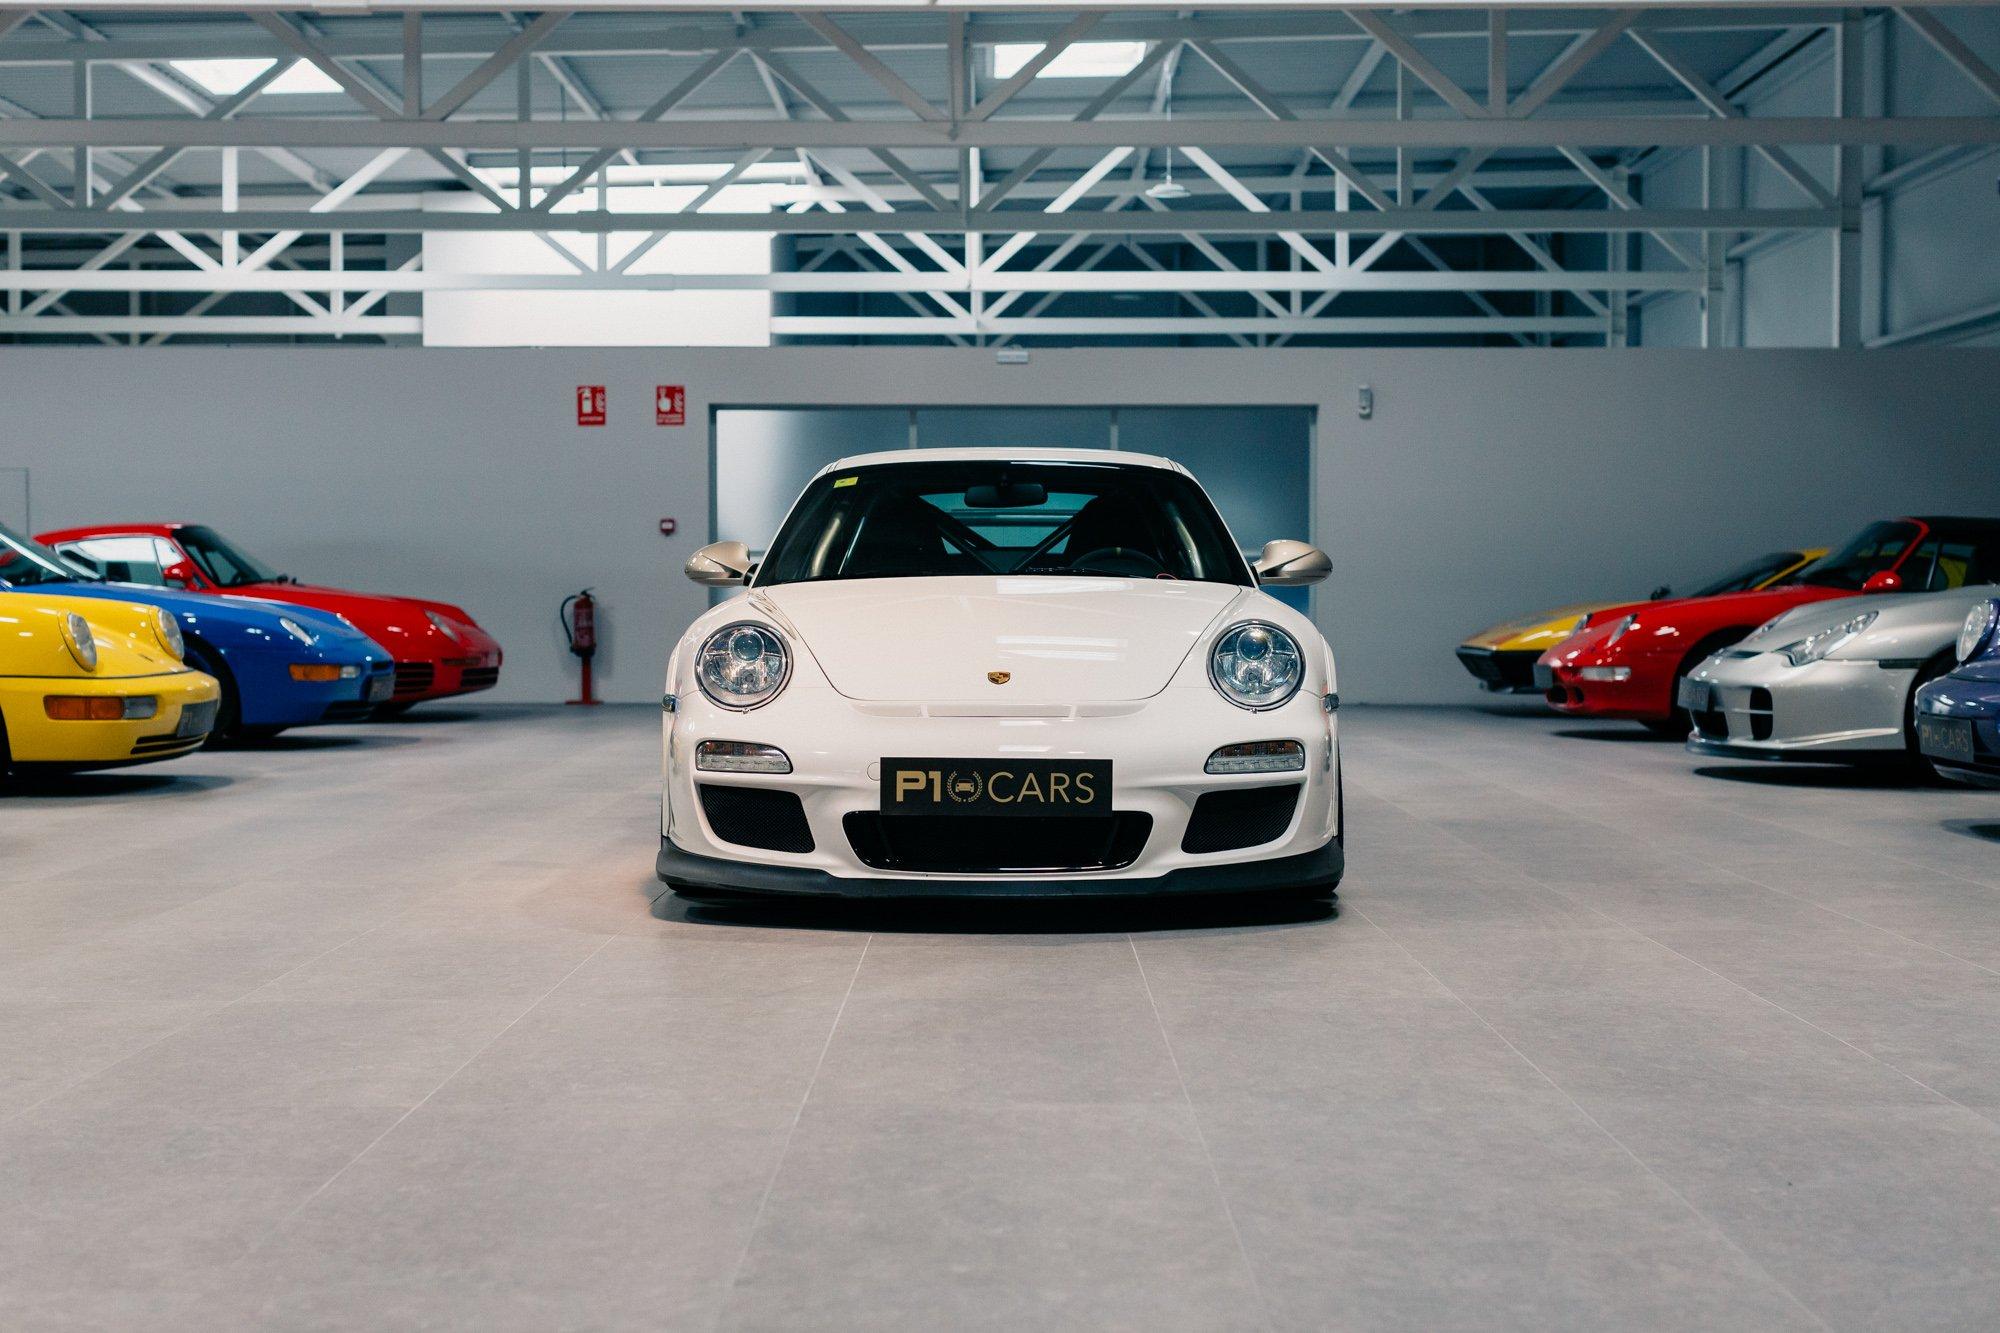 2011 Porsche 911 Gt3 997 2 Gt3 Rs Classic Driver Market